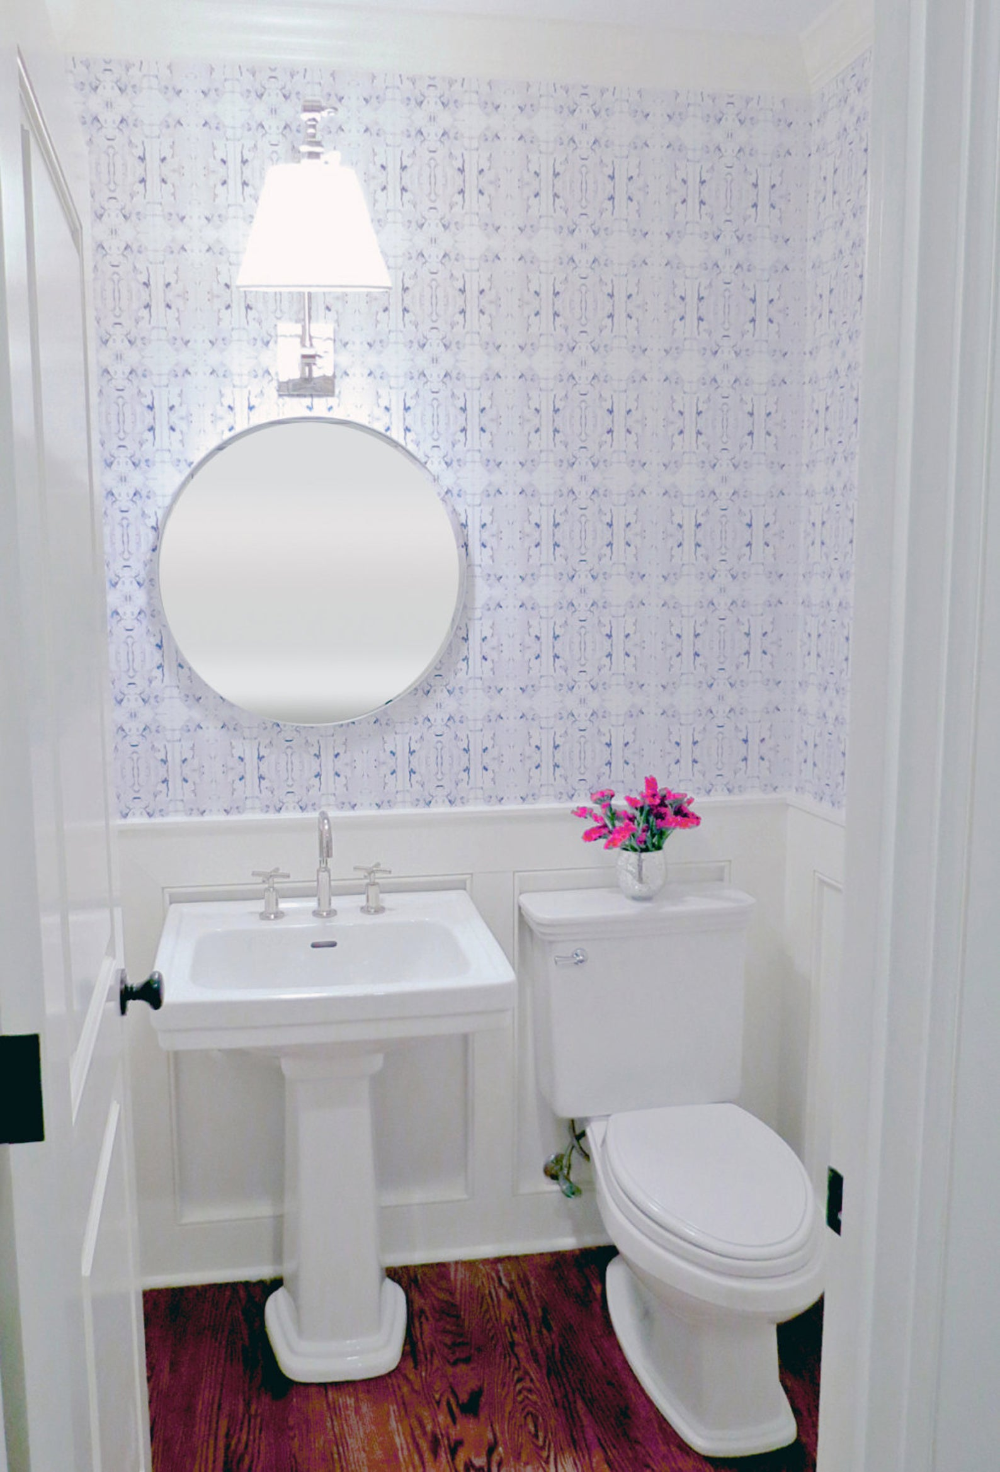 Removable Wallpaper Peel Stick Wallpaper Made In Usa Self Etsy Bathroom Wallpaper Bathroom Styling Small Bathroom